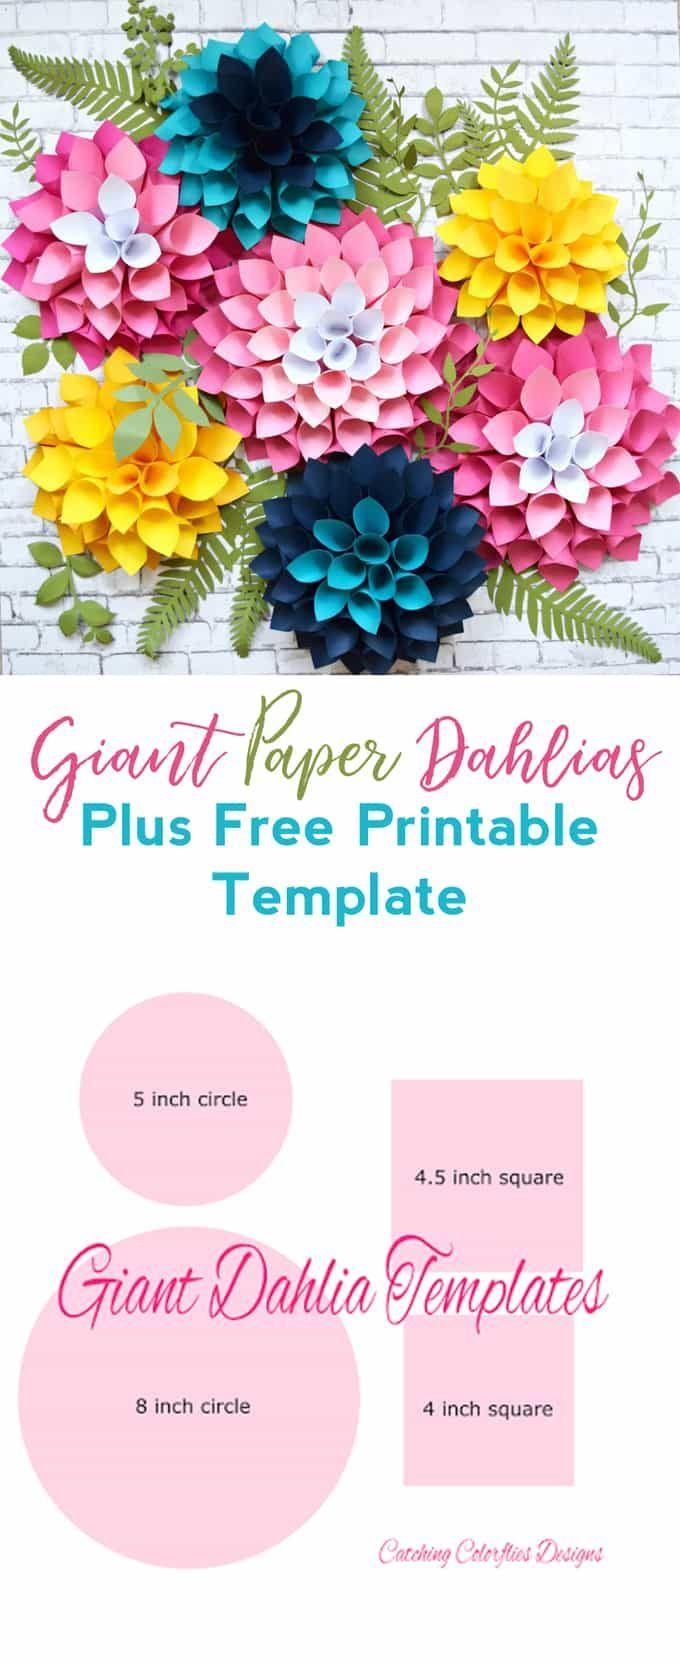 Step by step easy giant paper dahlia tutorial